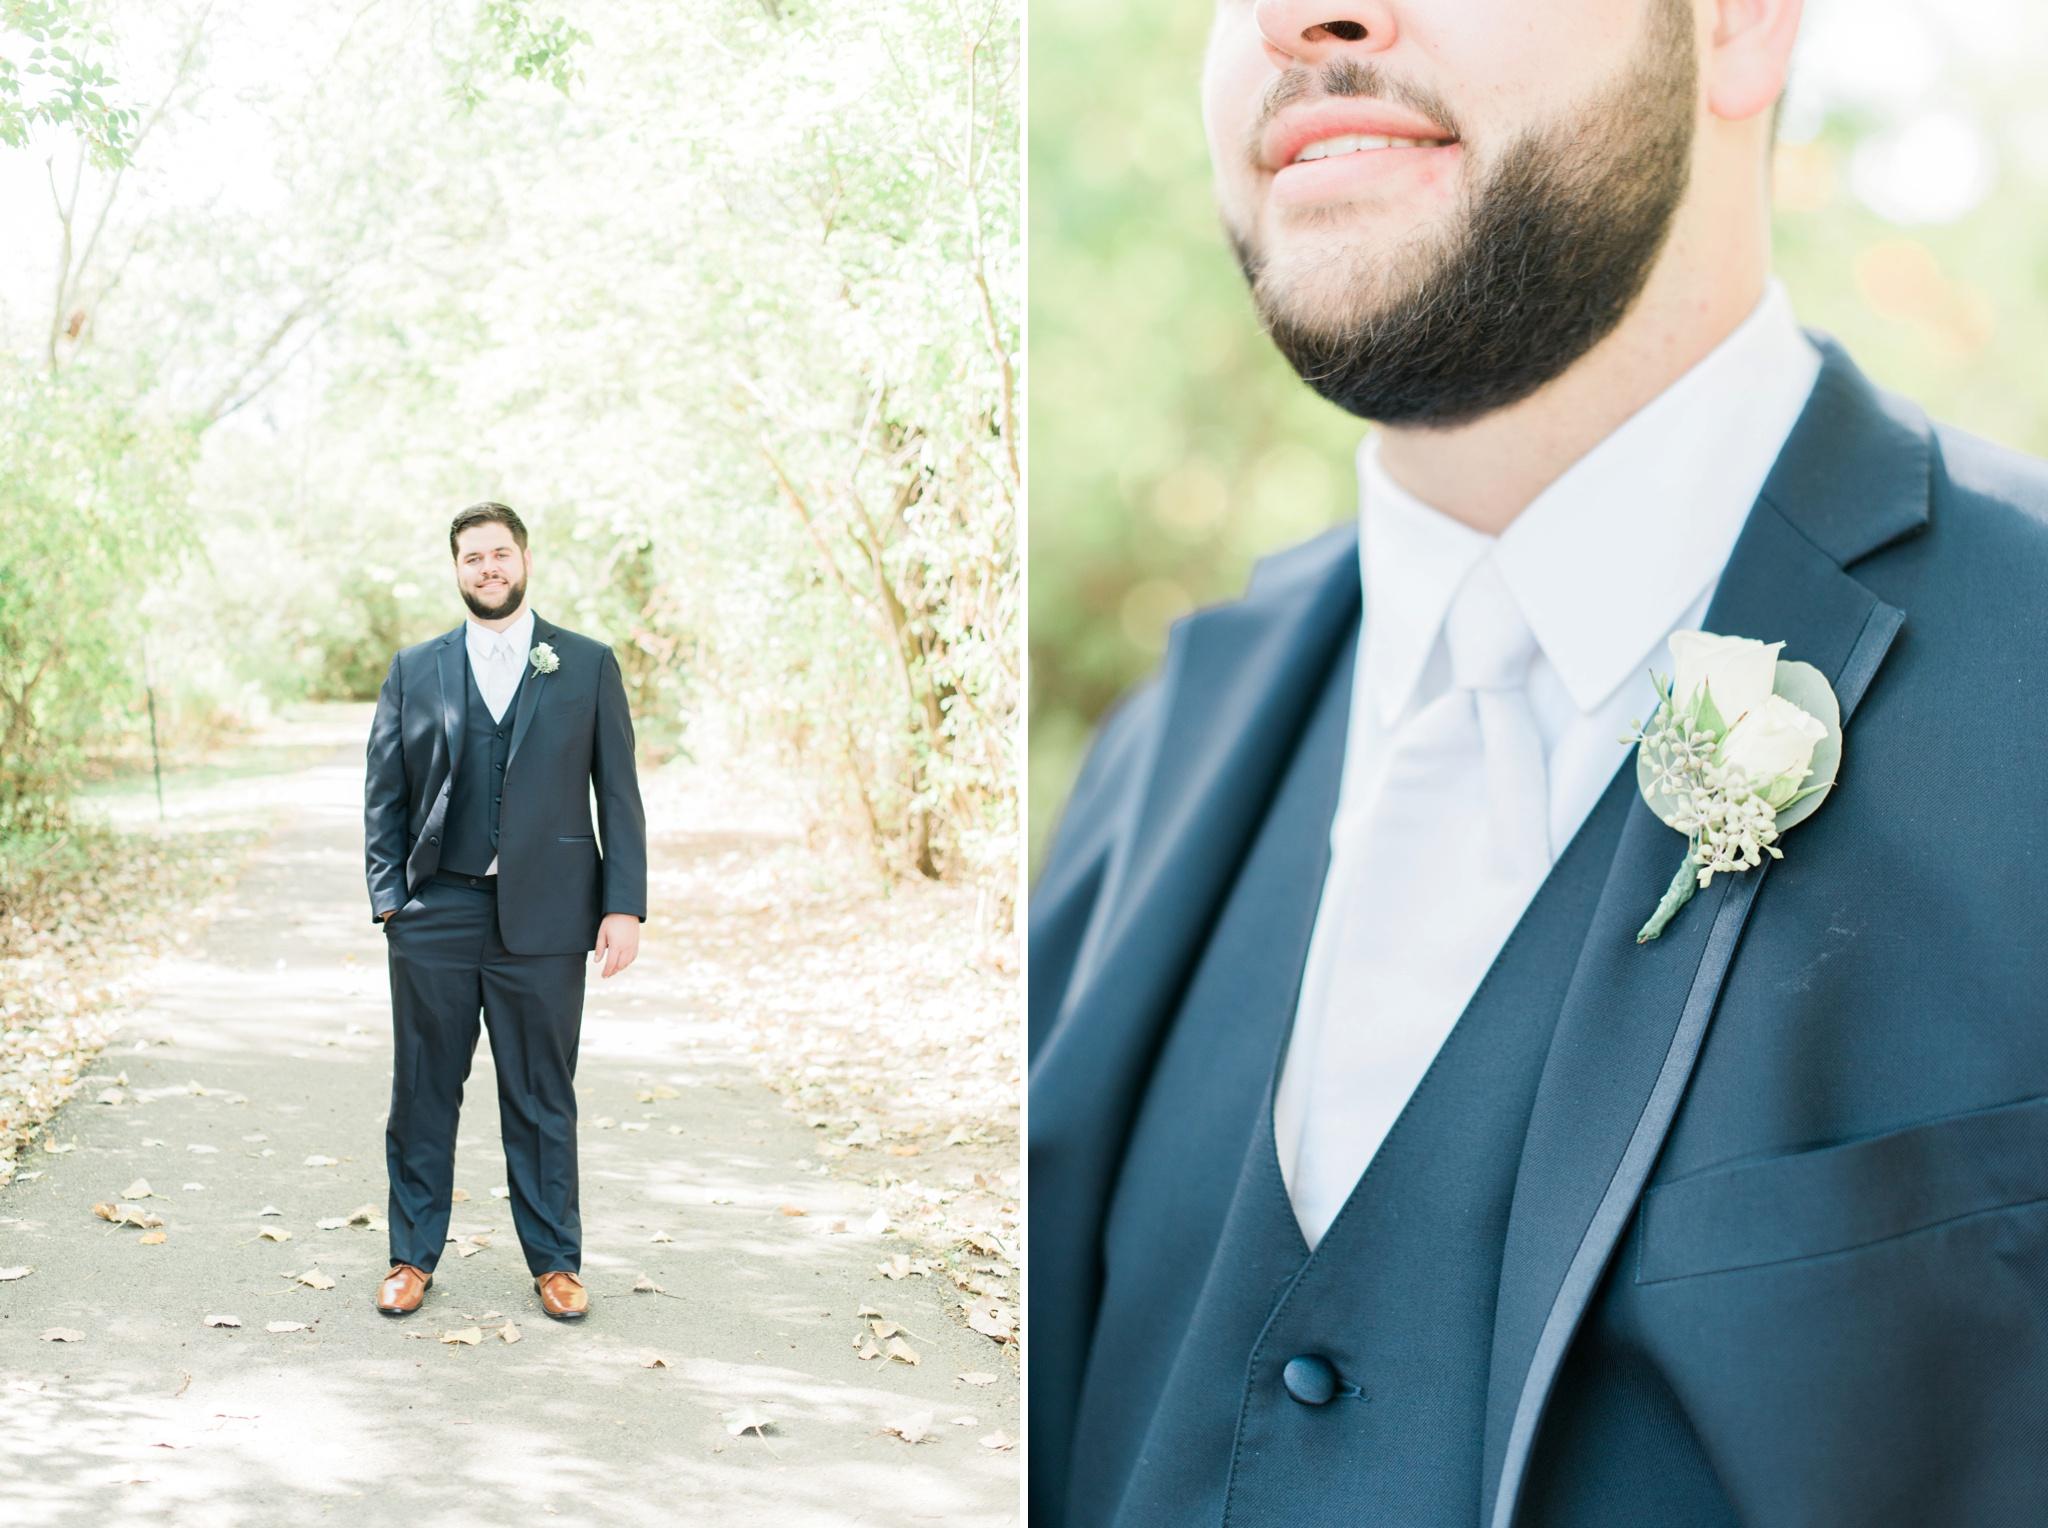 aladdin-shrine-center-wedding-grove-city-ohio-amber-jared_0023.jpg